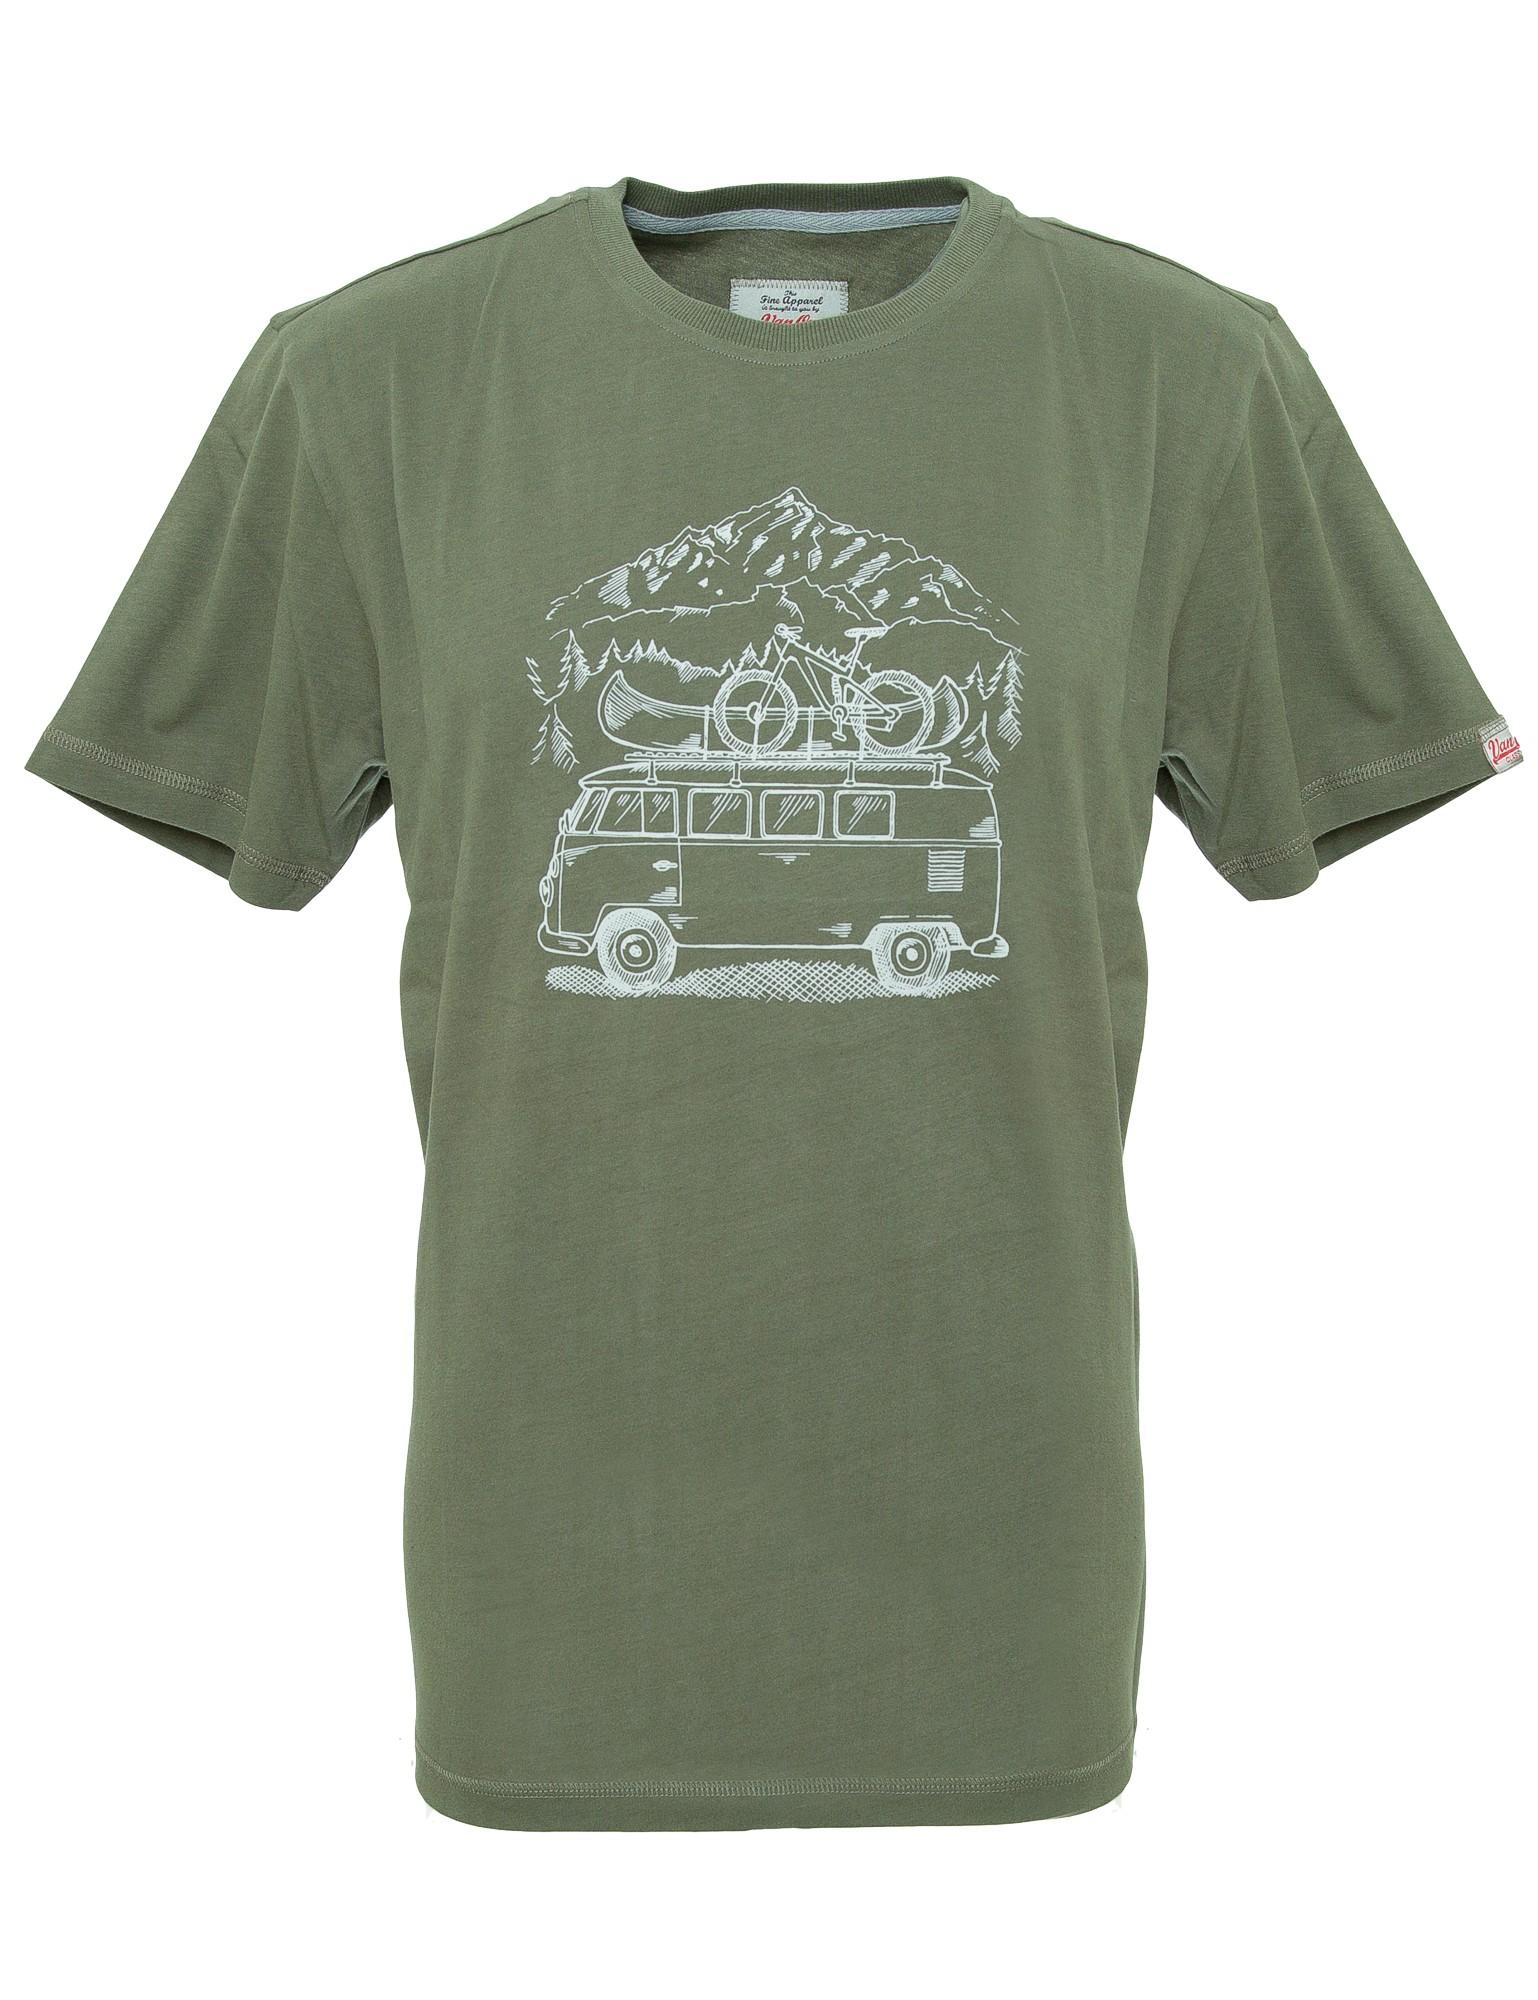 Herren T-Shirt VW Bulli »ZUGSPITZE« Olivgrün